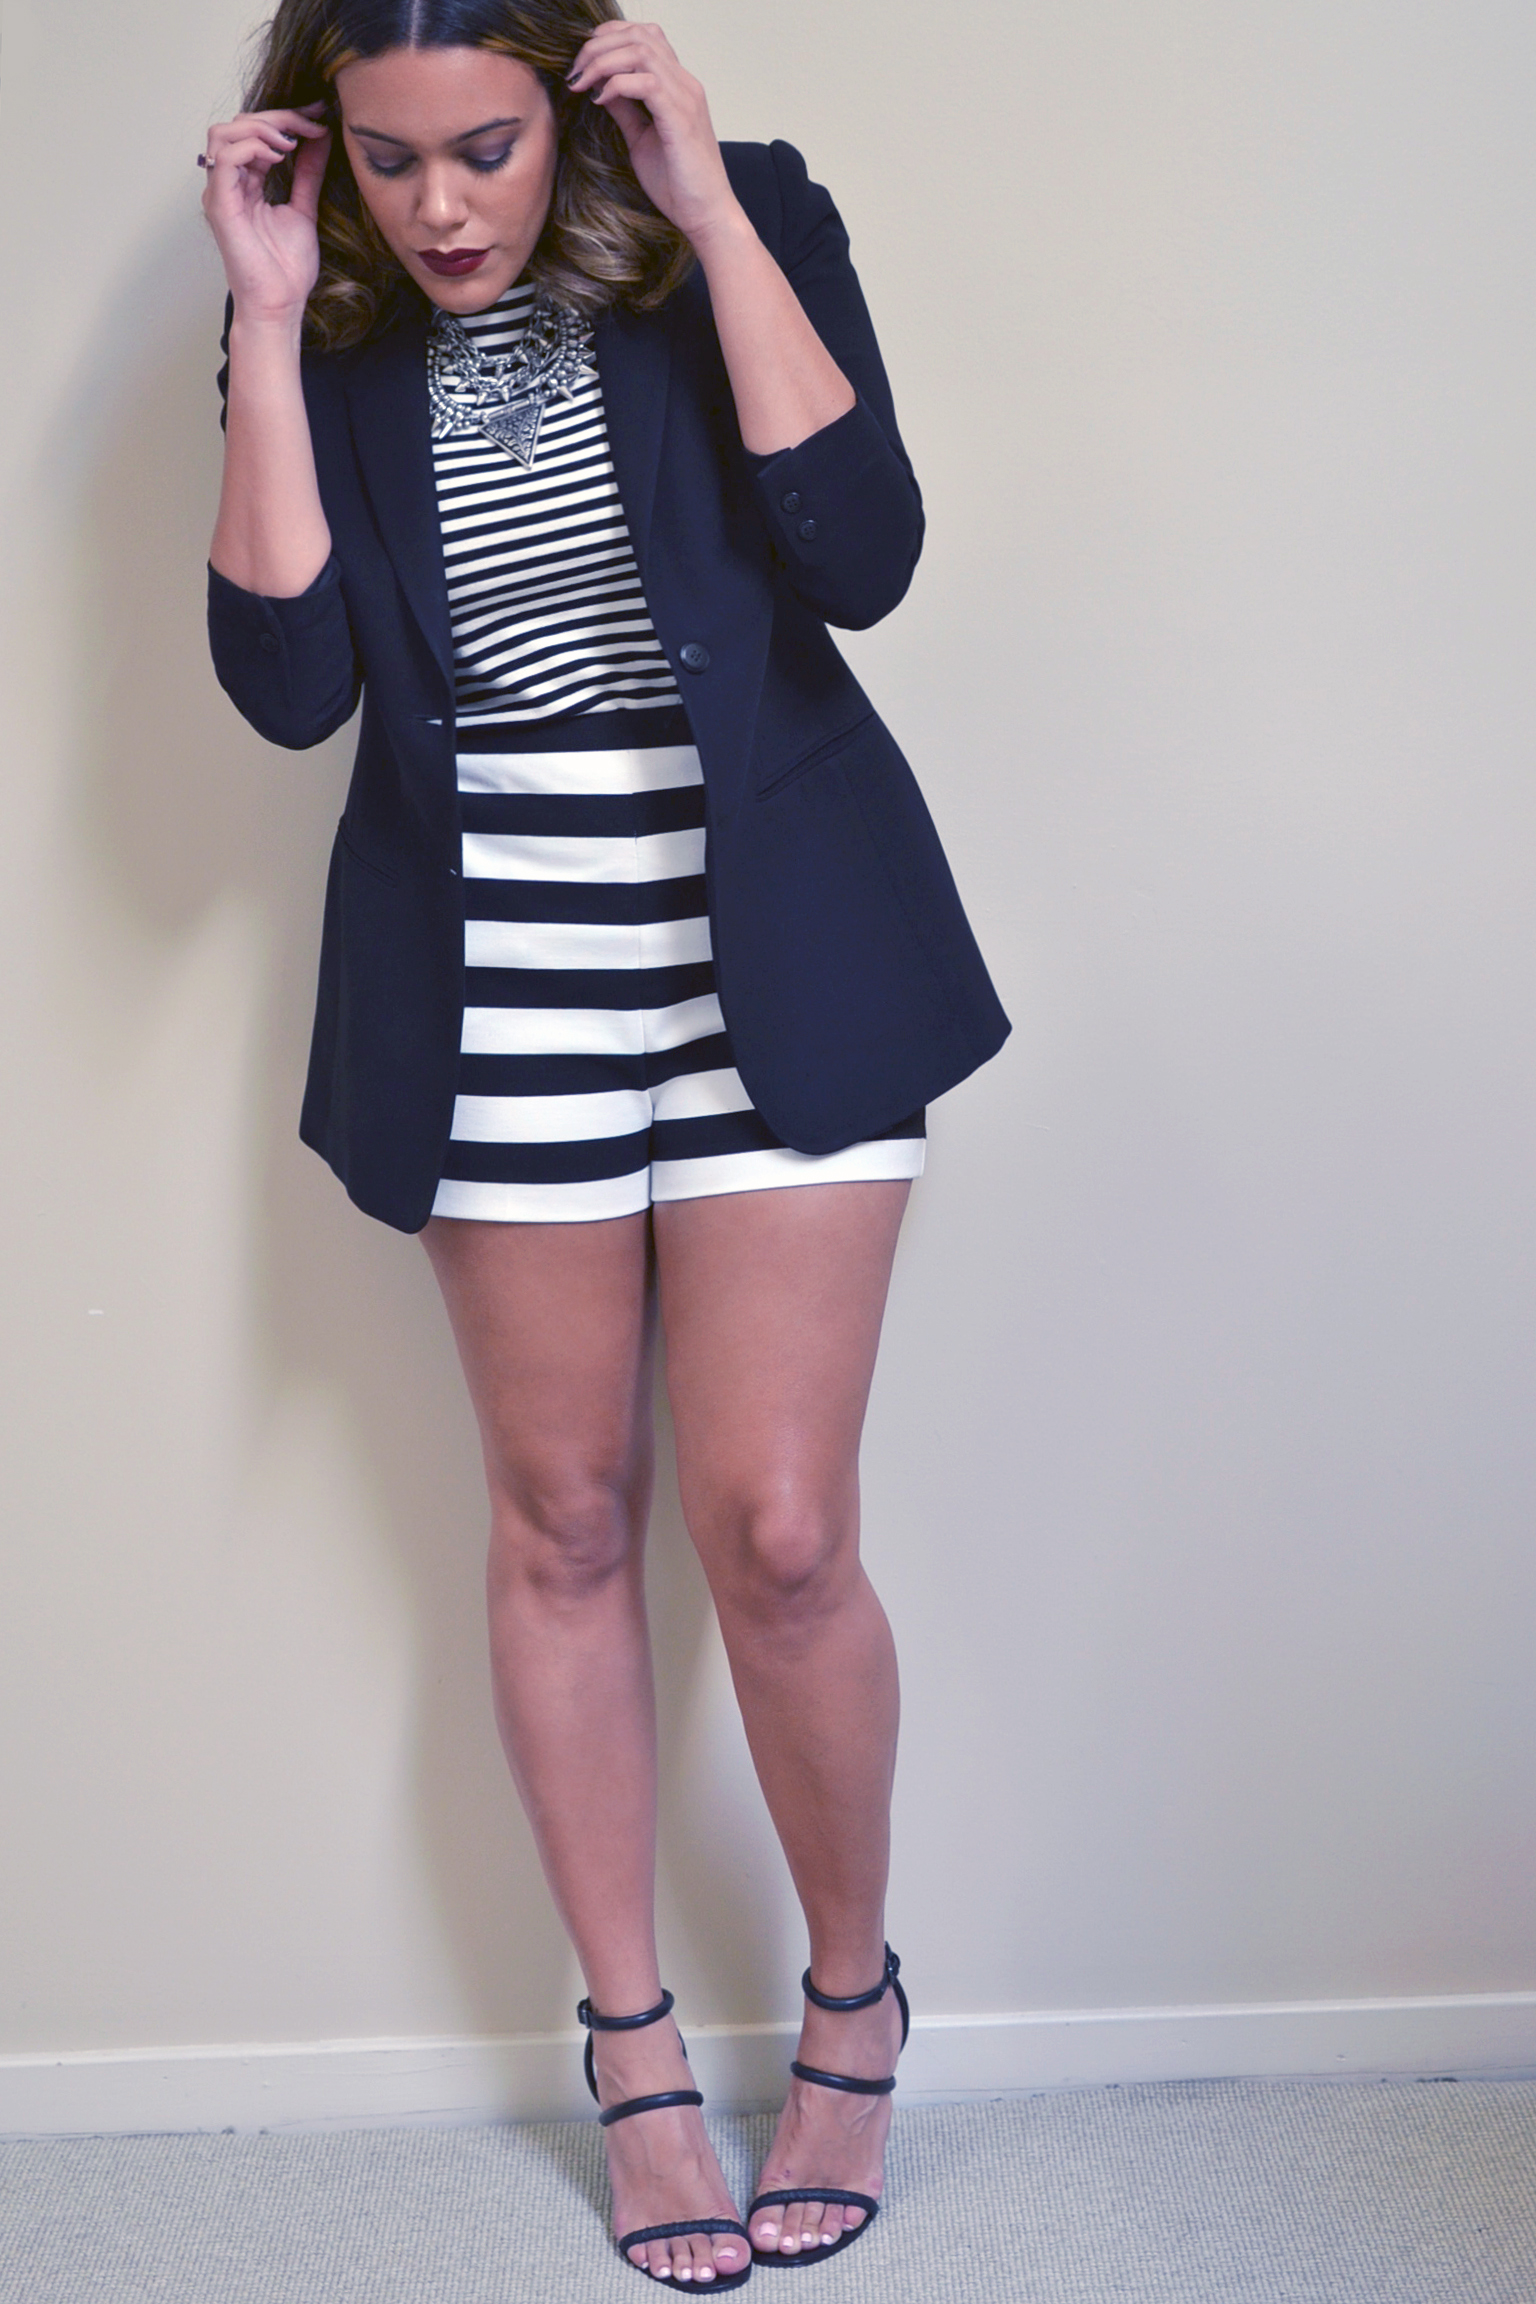 how-to-wear-stripes-on-stripes-print-mixing-black-and-white-zara-dress-express-shorts.jpg